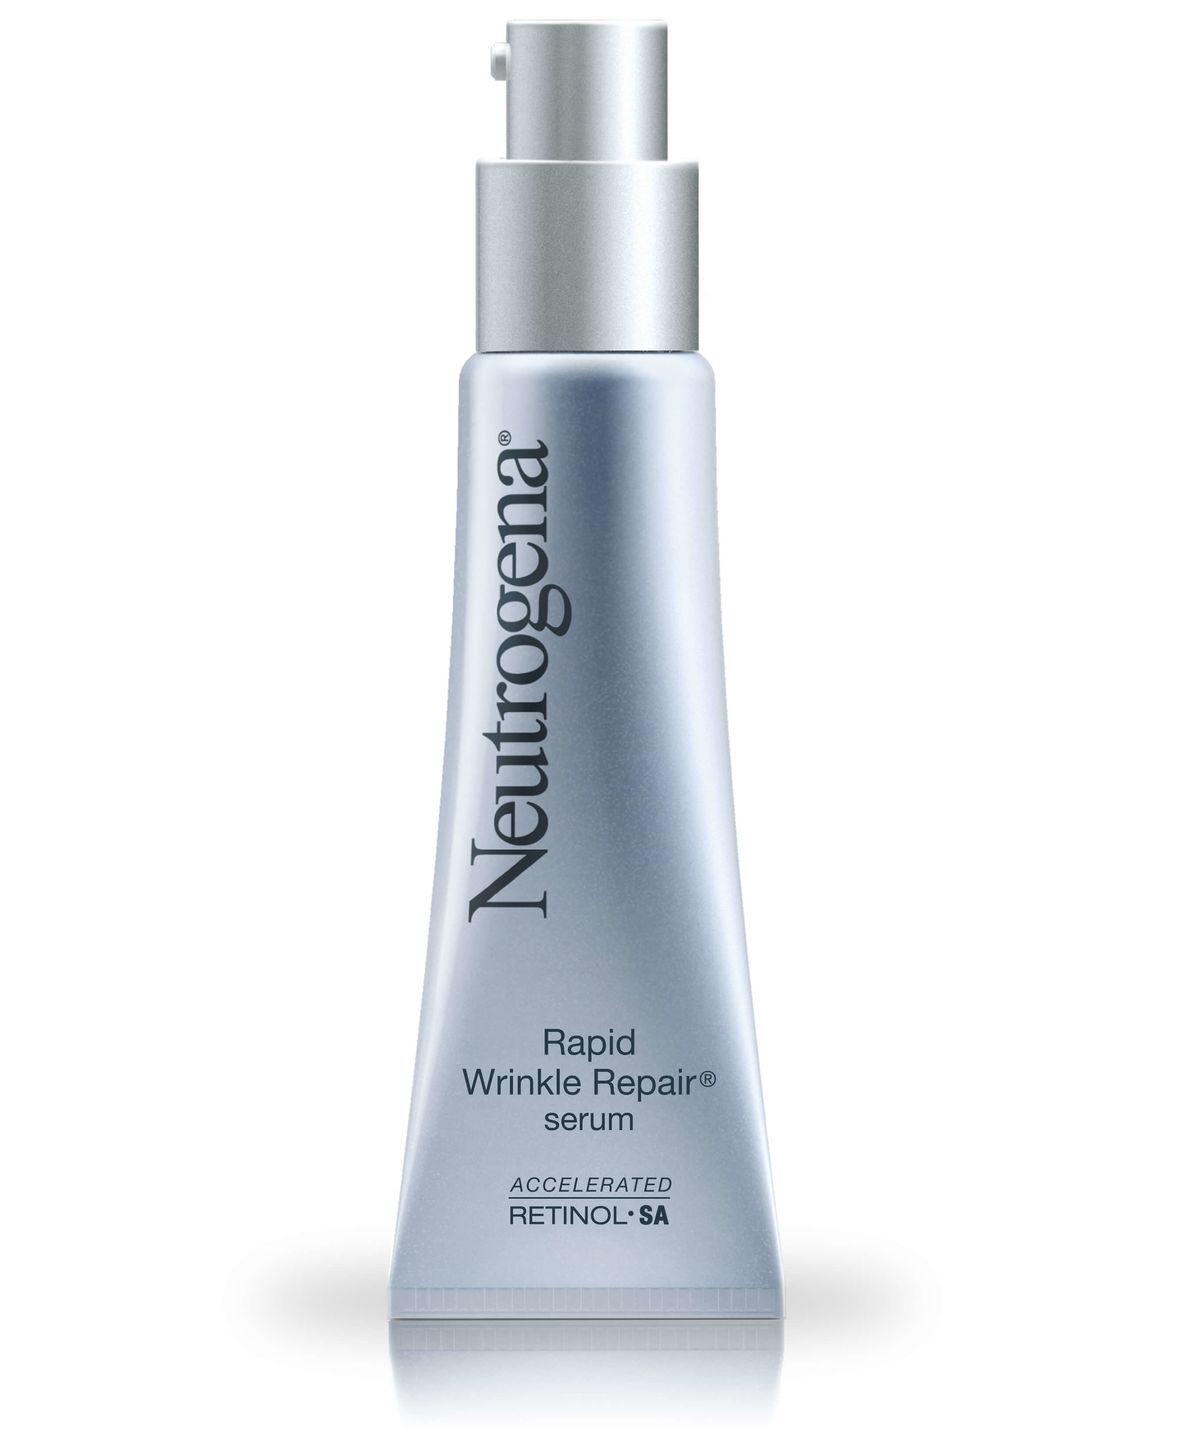 Serum chống lão hóa Neutrogena Rapid Wrinkle Repair Serum